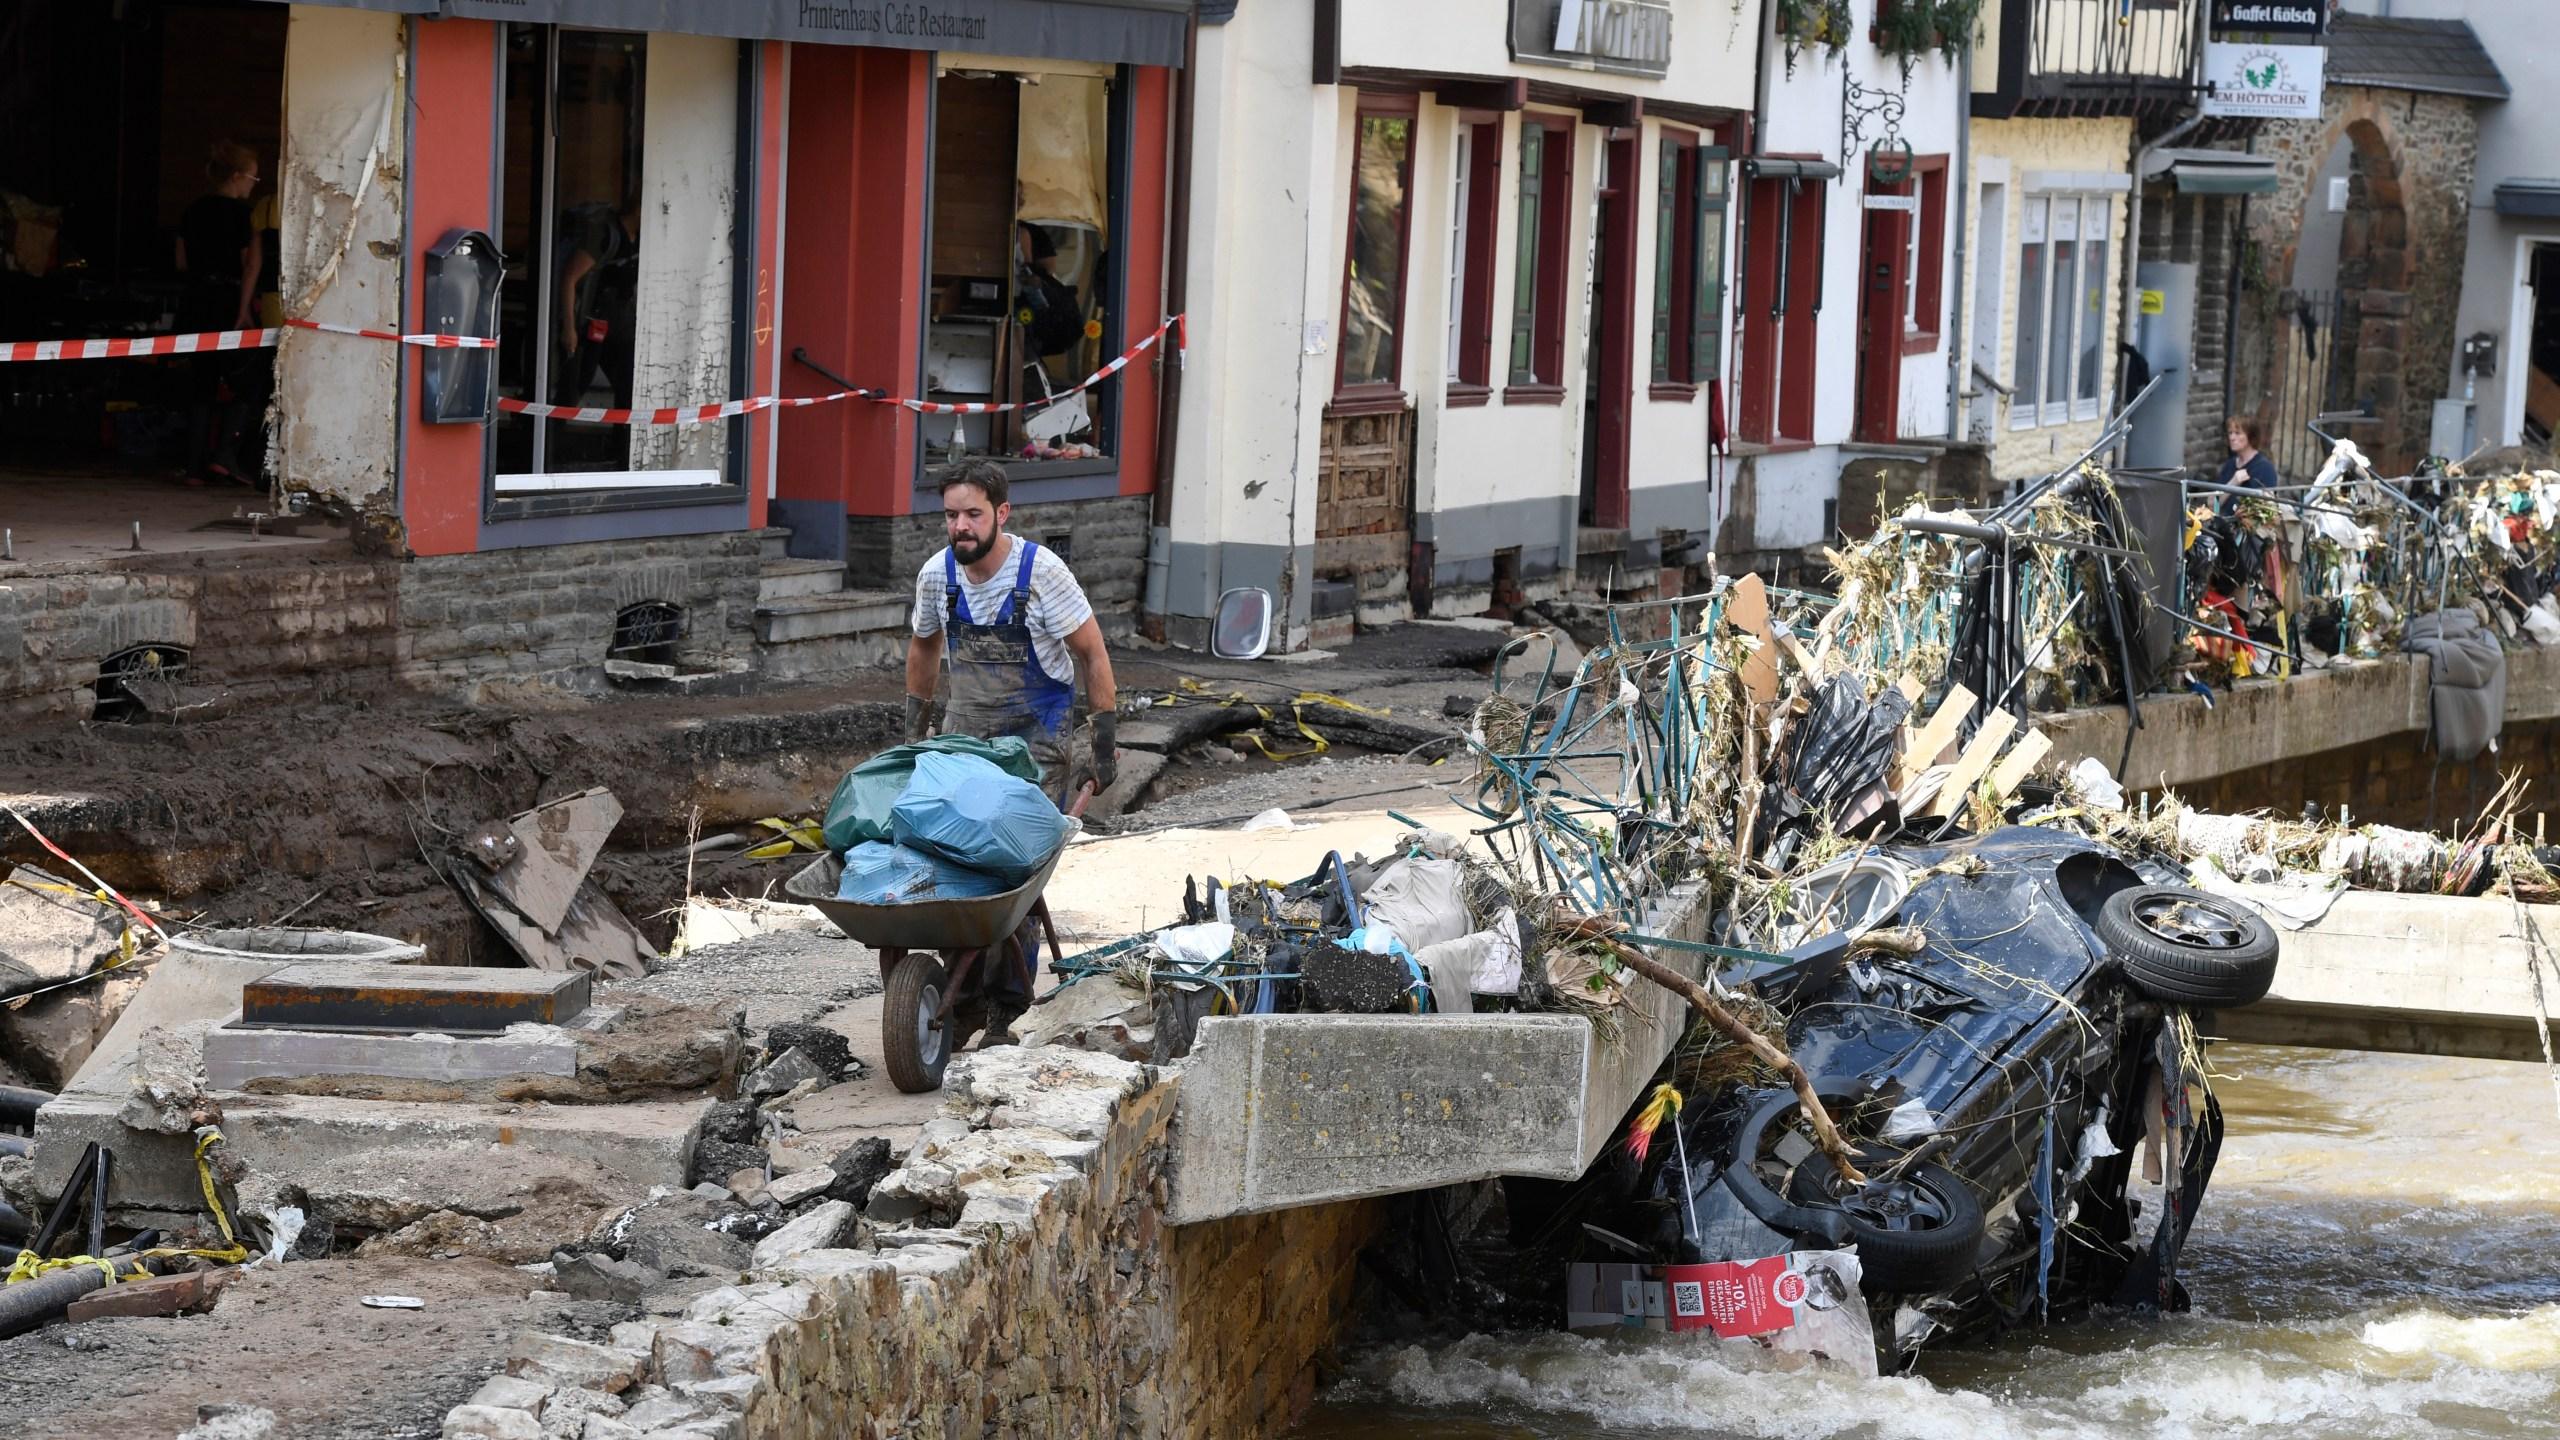 German flood deaths rise above 130 as president is set to visit - Tatahfonewsarena